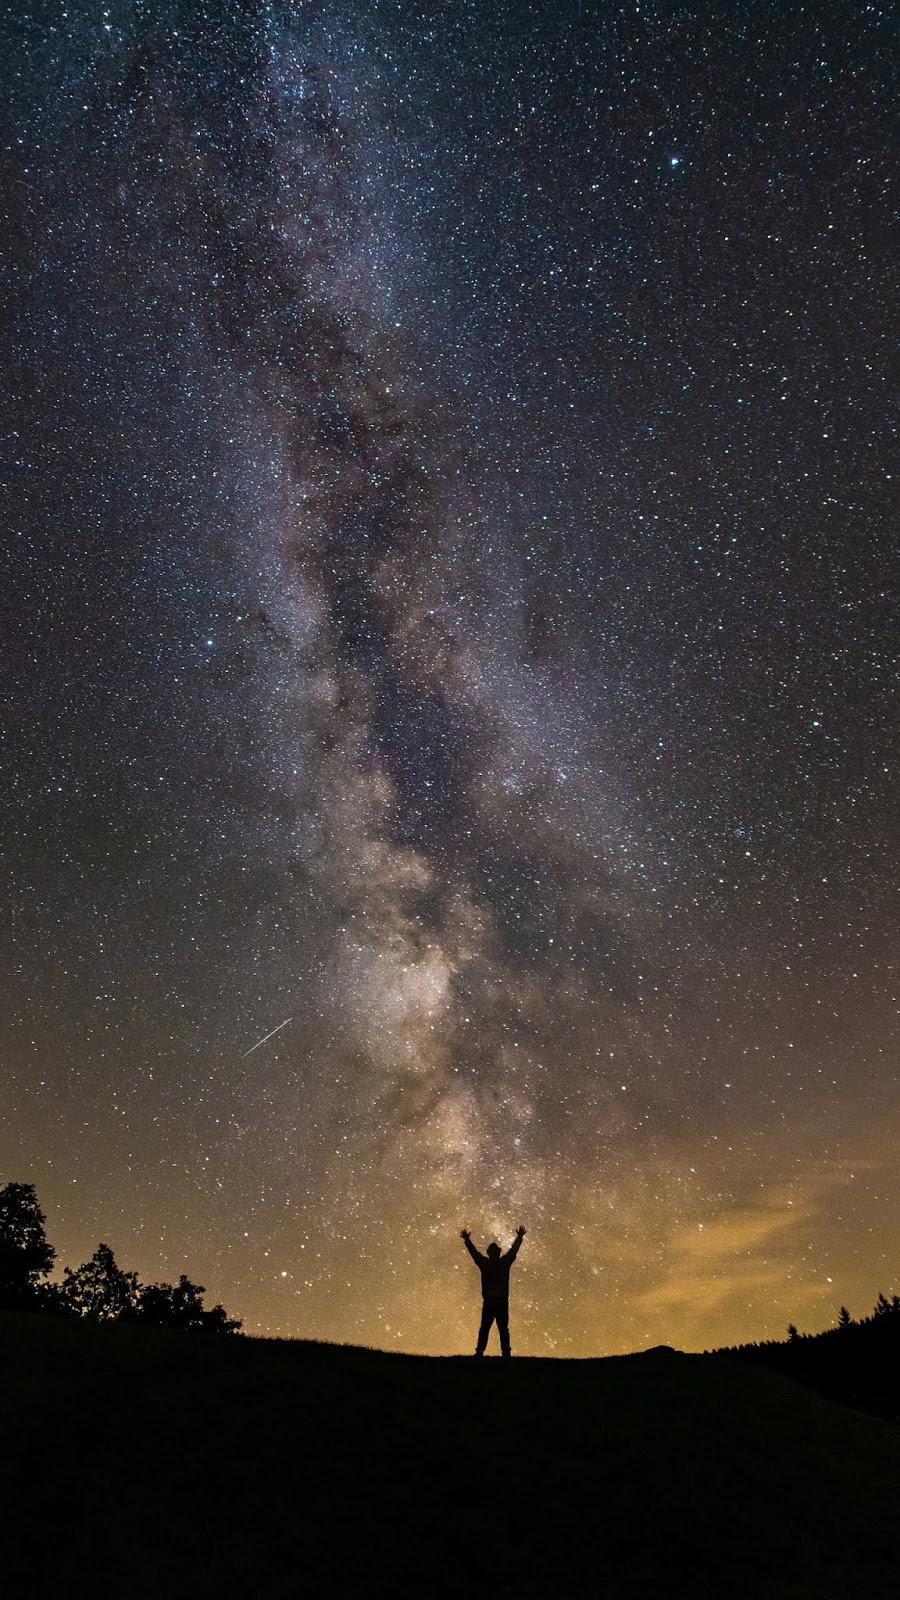 Milky way under night sky